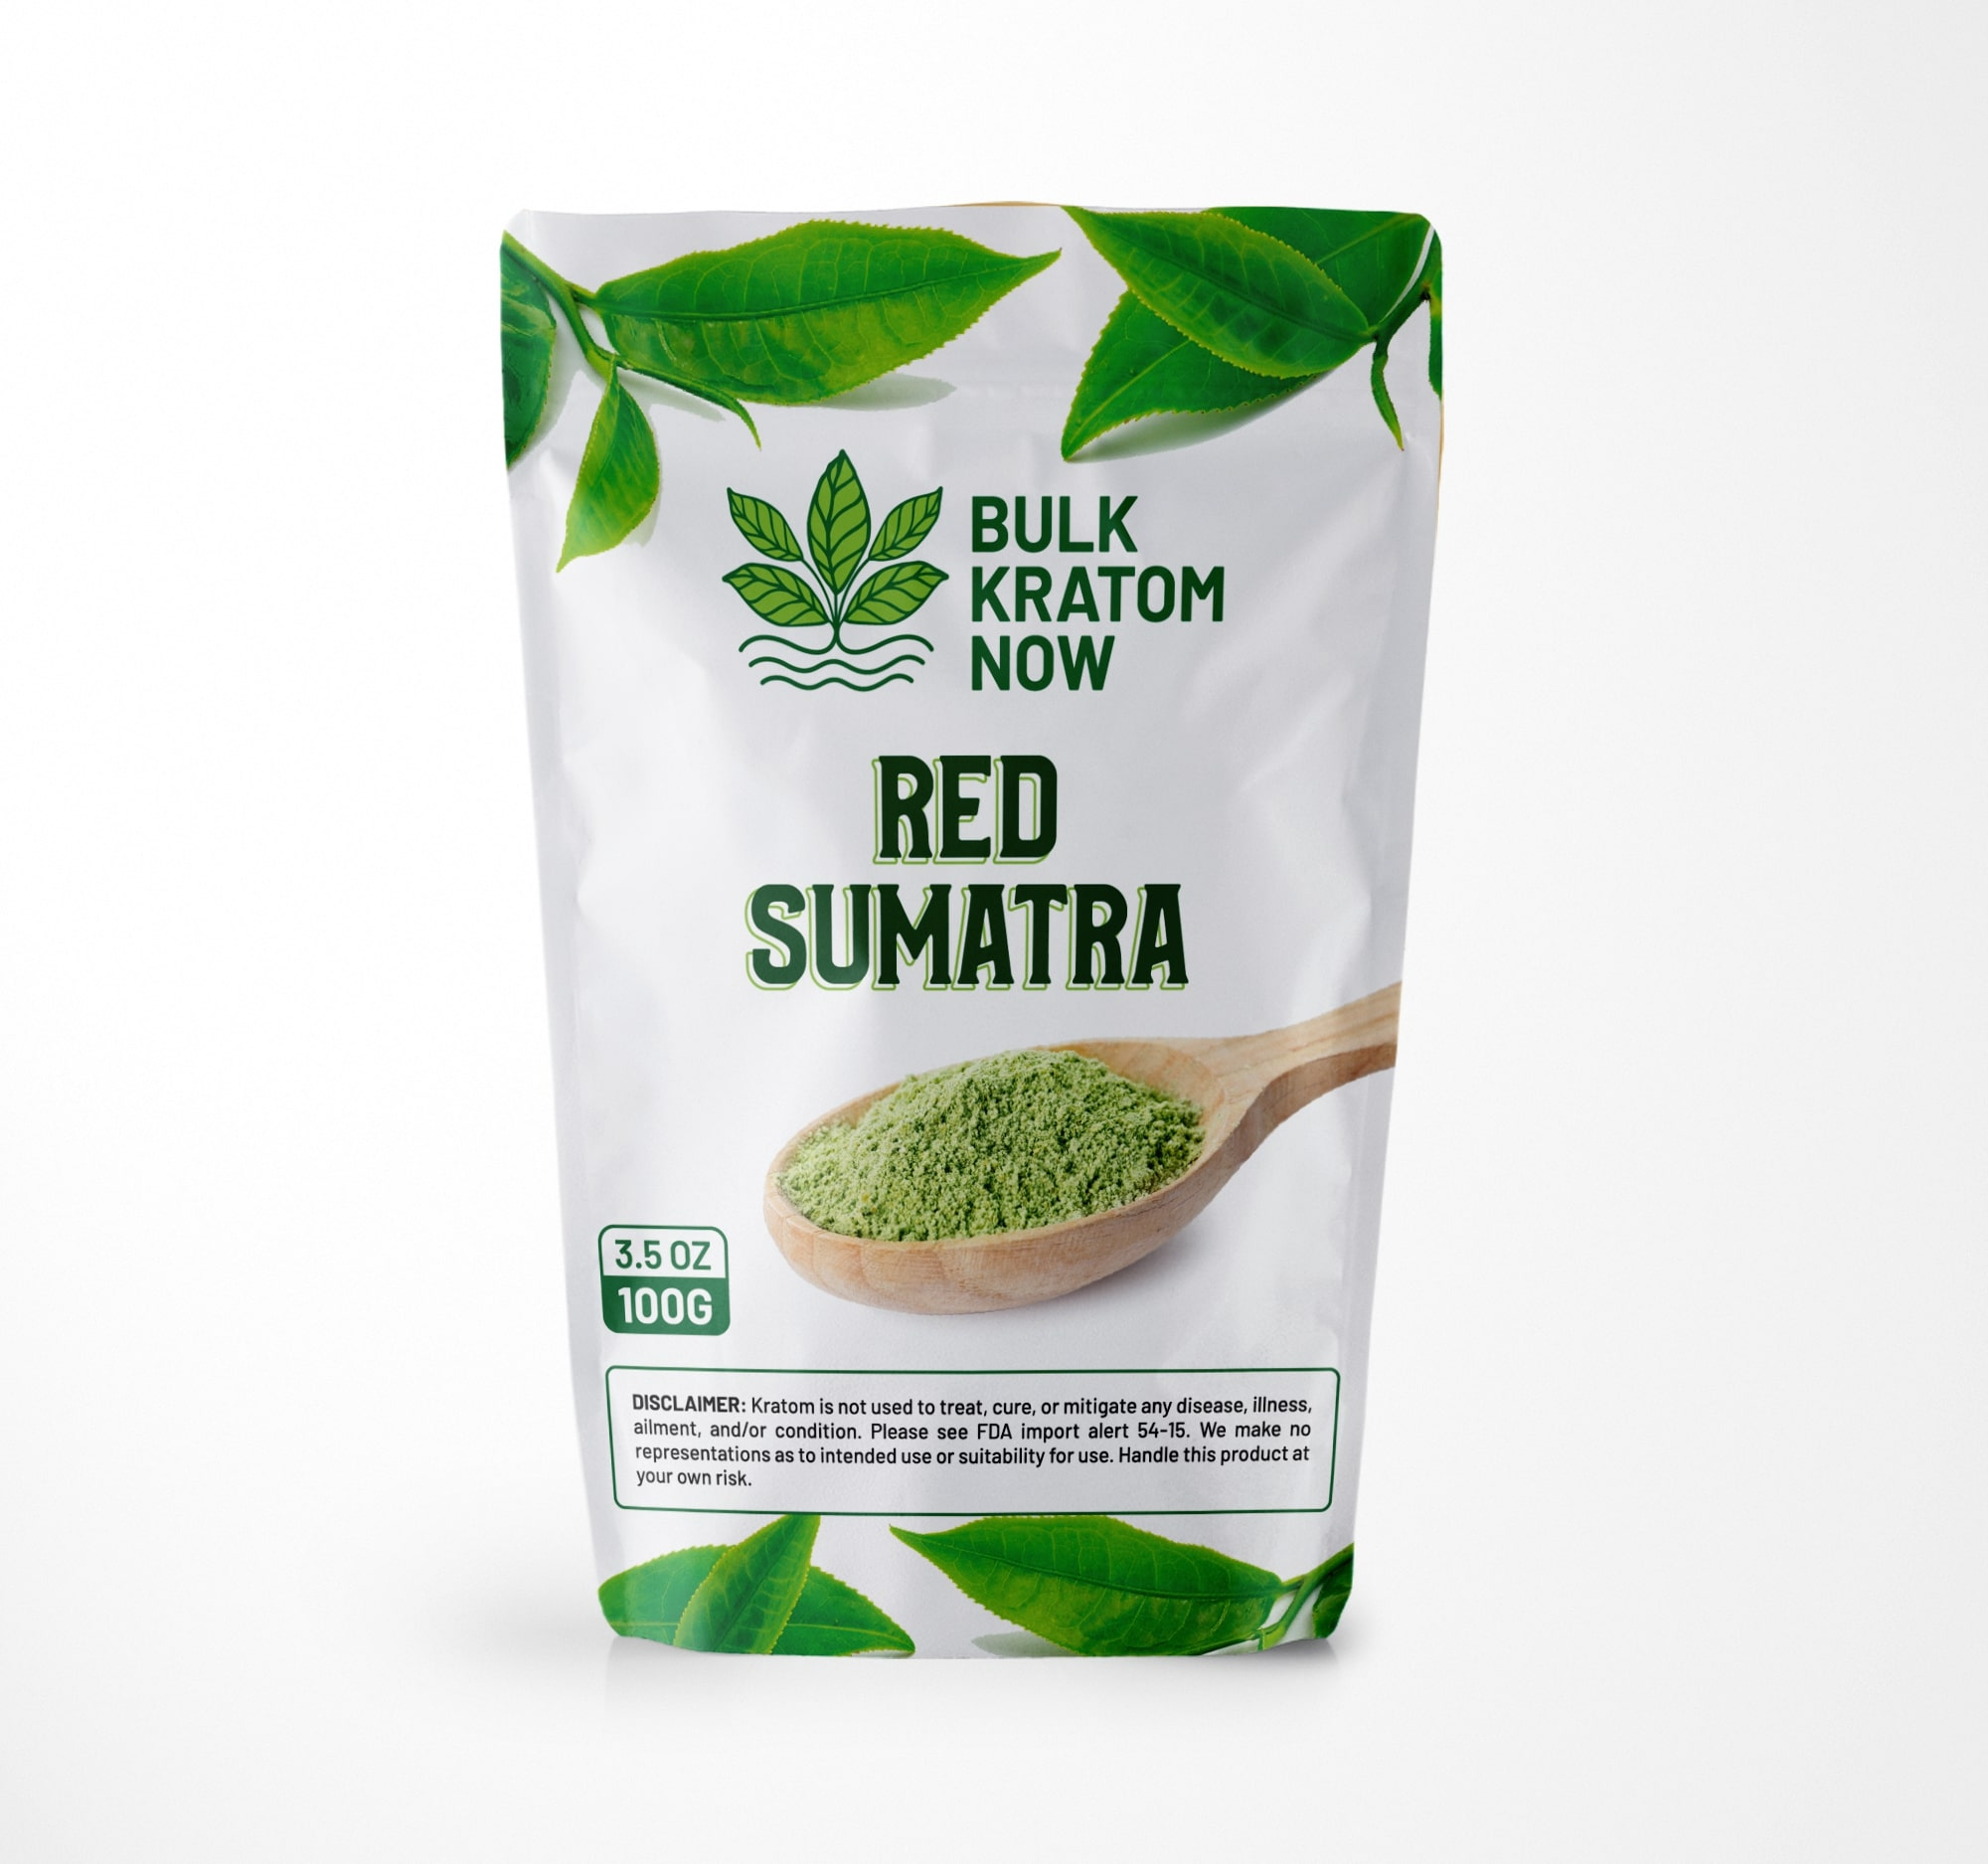 Red Sumatra Bulk Kratom